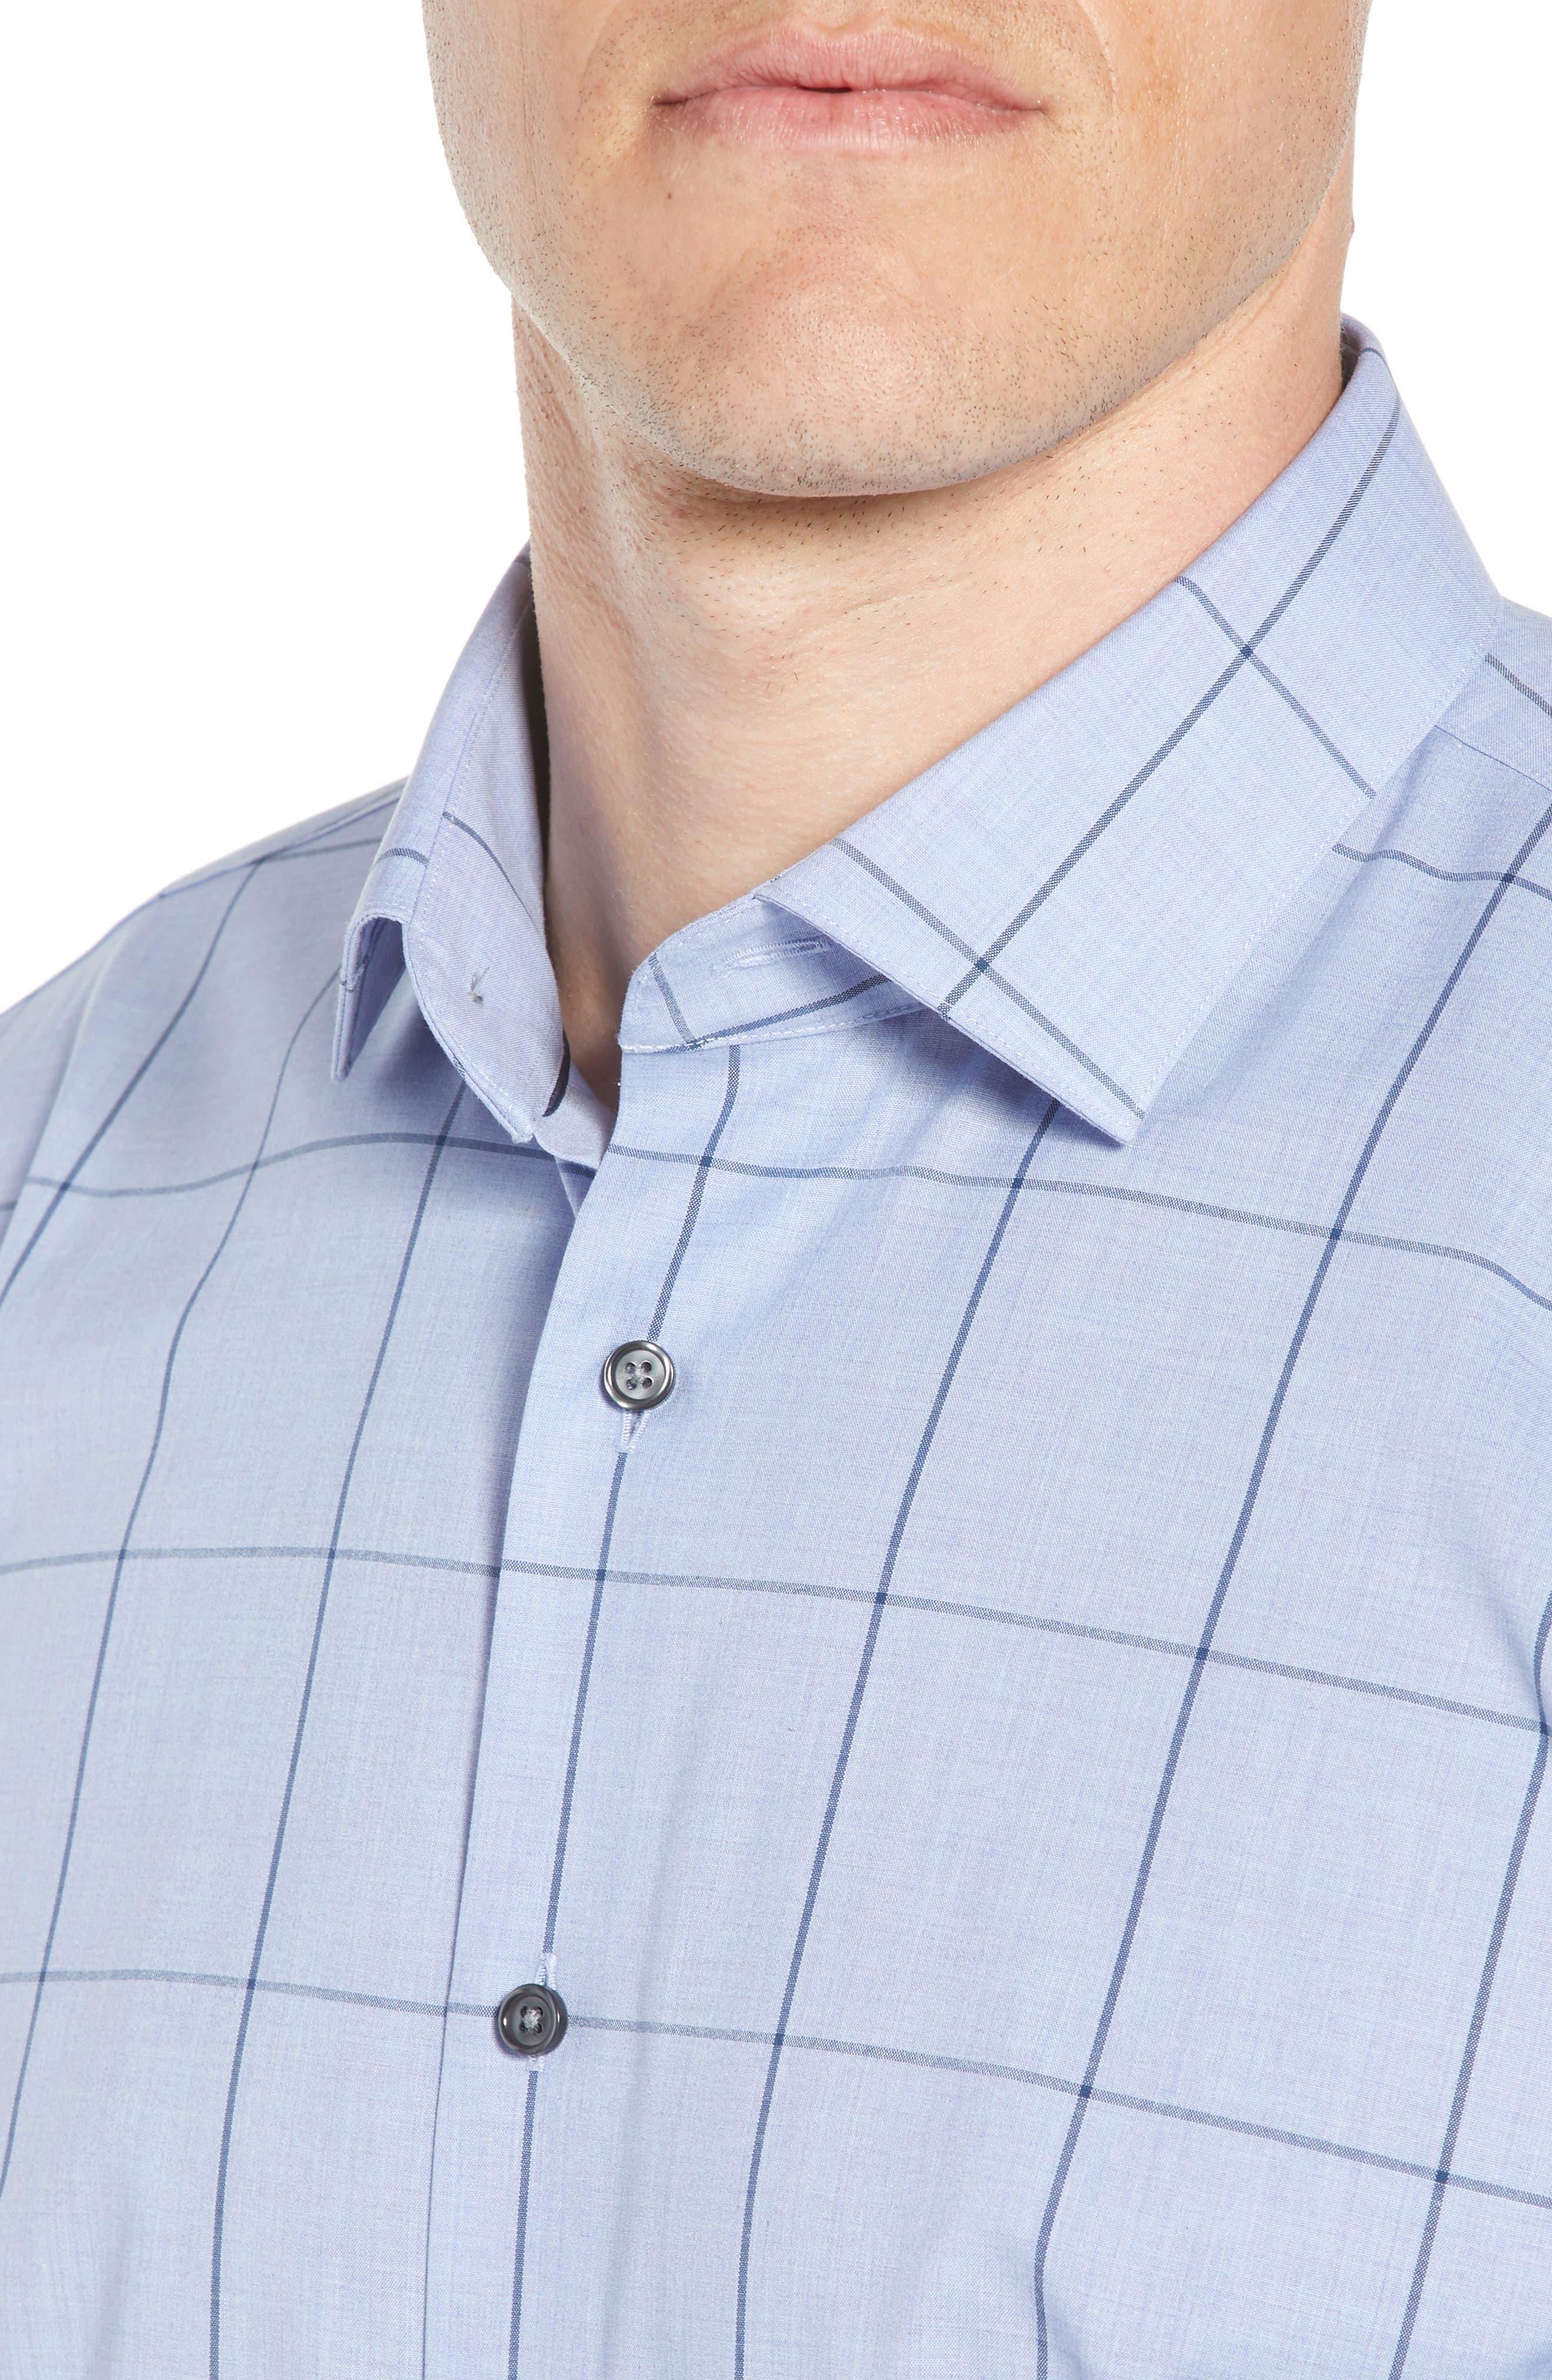 Trim Fit Non-Iron Windowpane Dress Shirt,                             Alternate thumbnail 2, color,                             BLUE HAZE